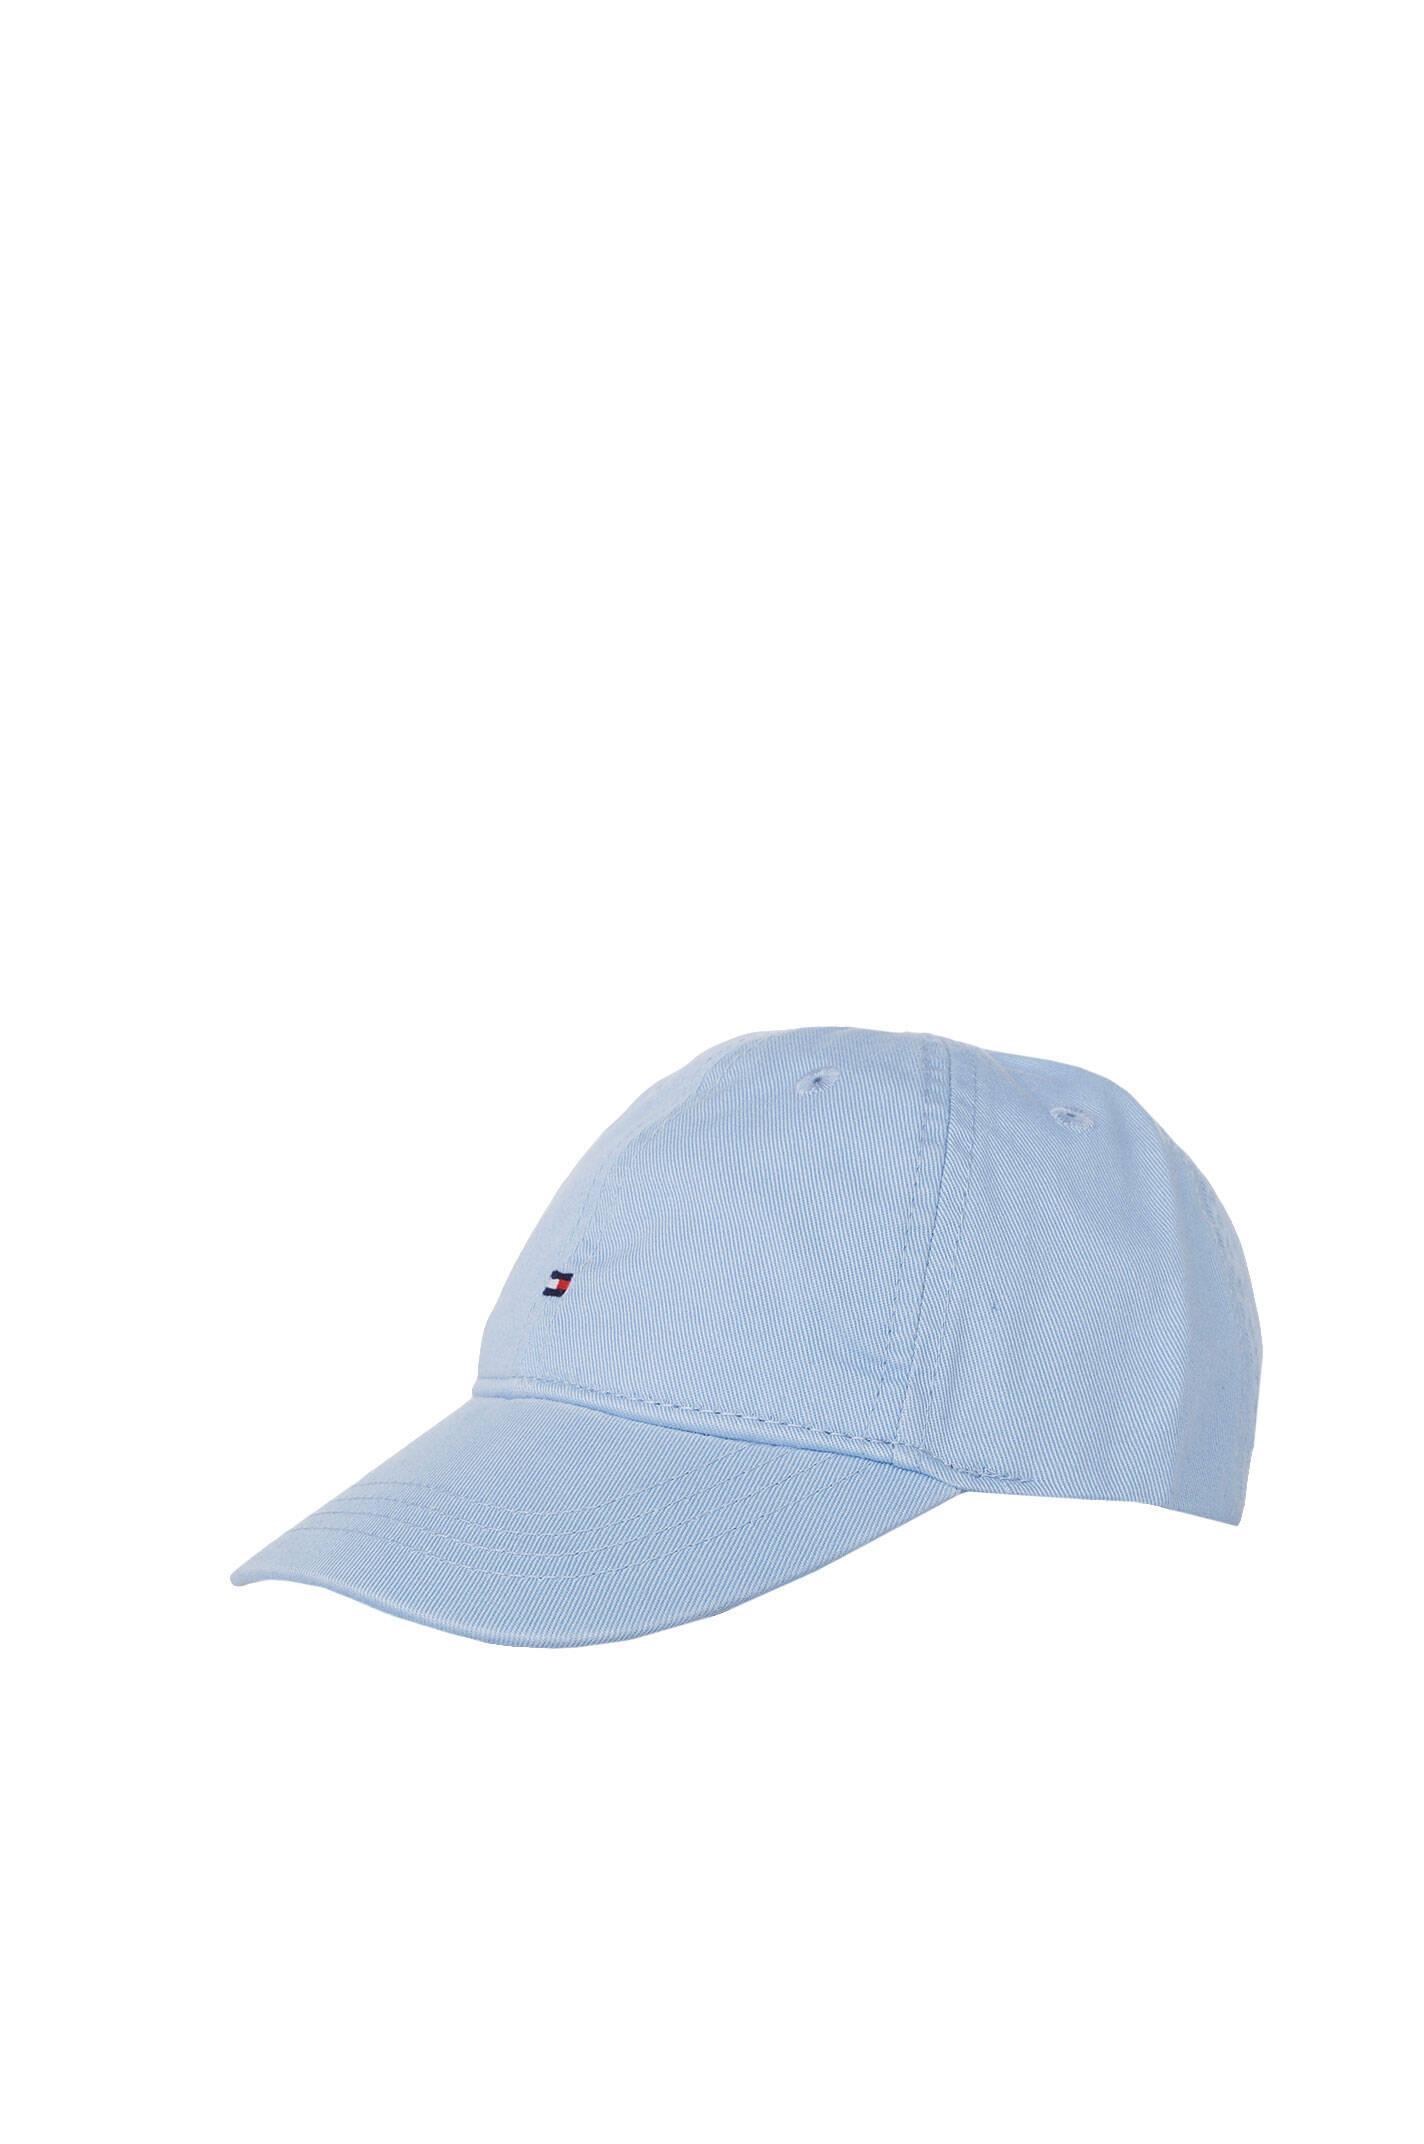 Ame Basic Baseball Cap Tommy Hilfiger  03fb71fd758